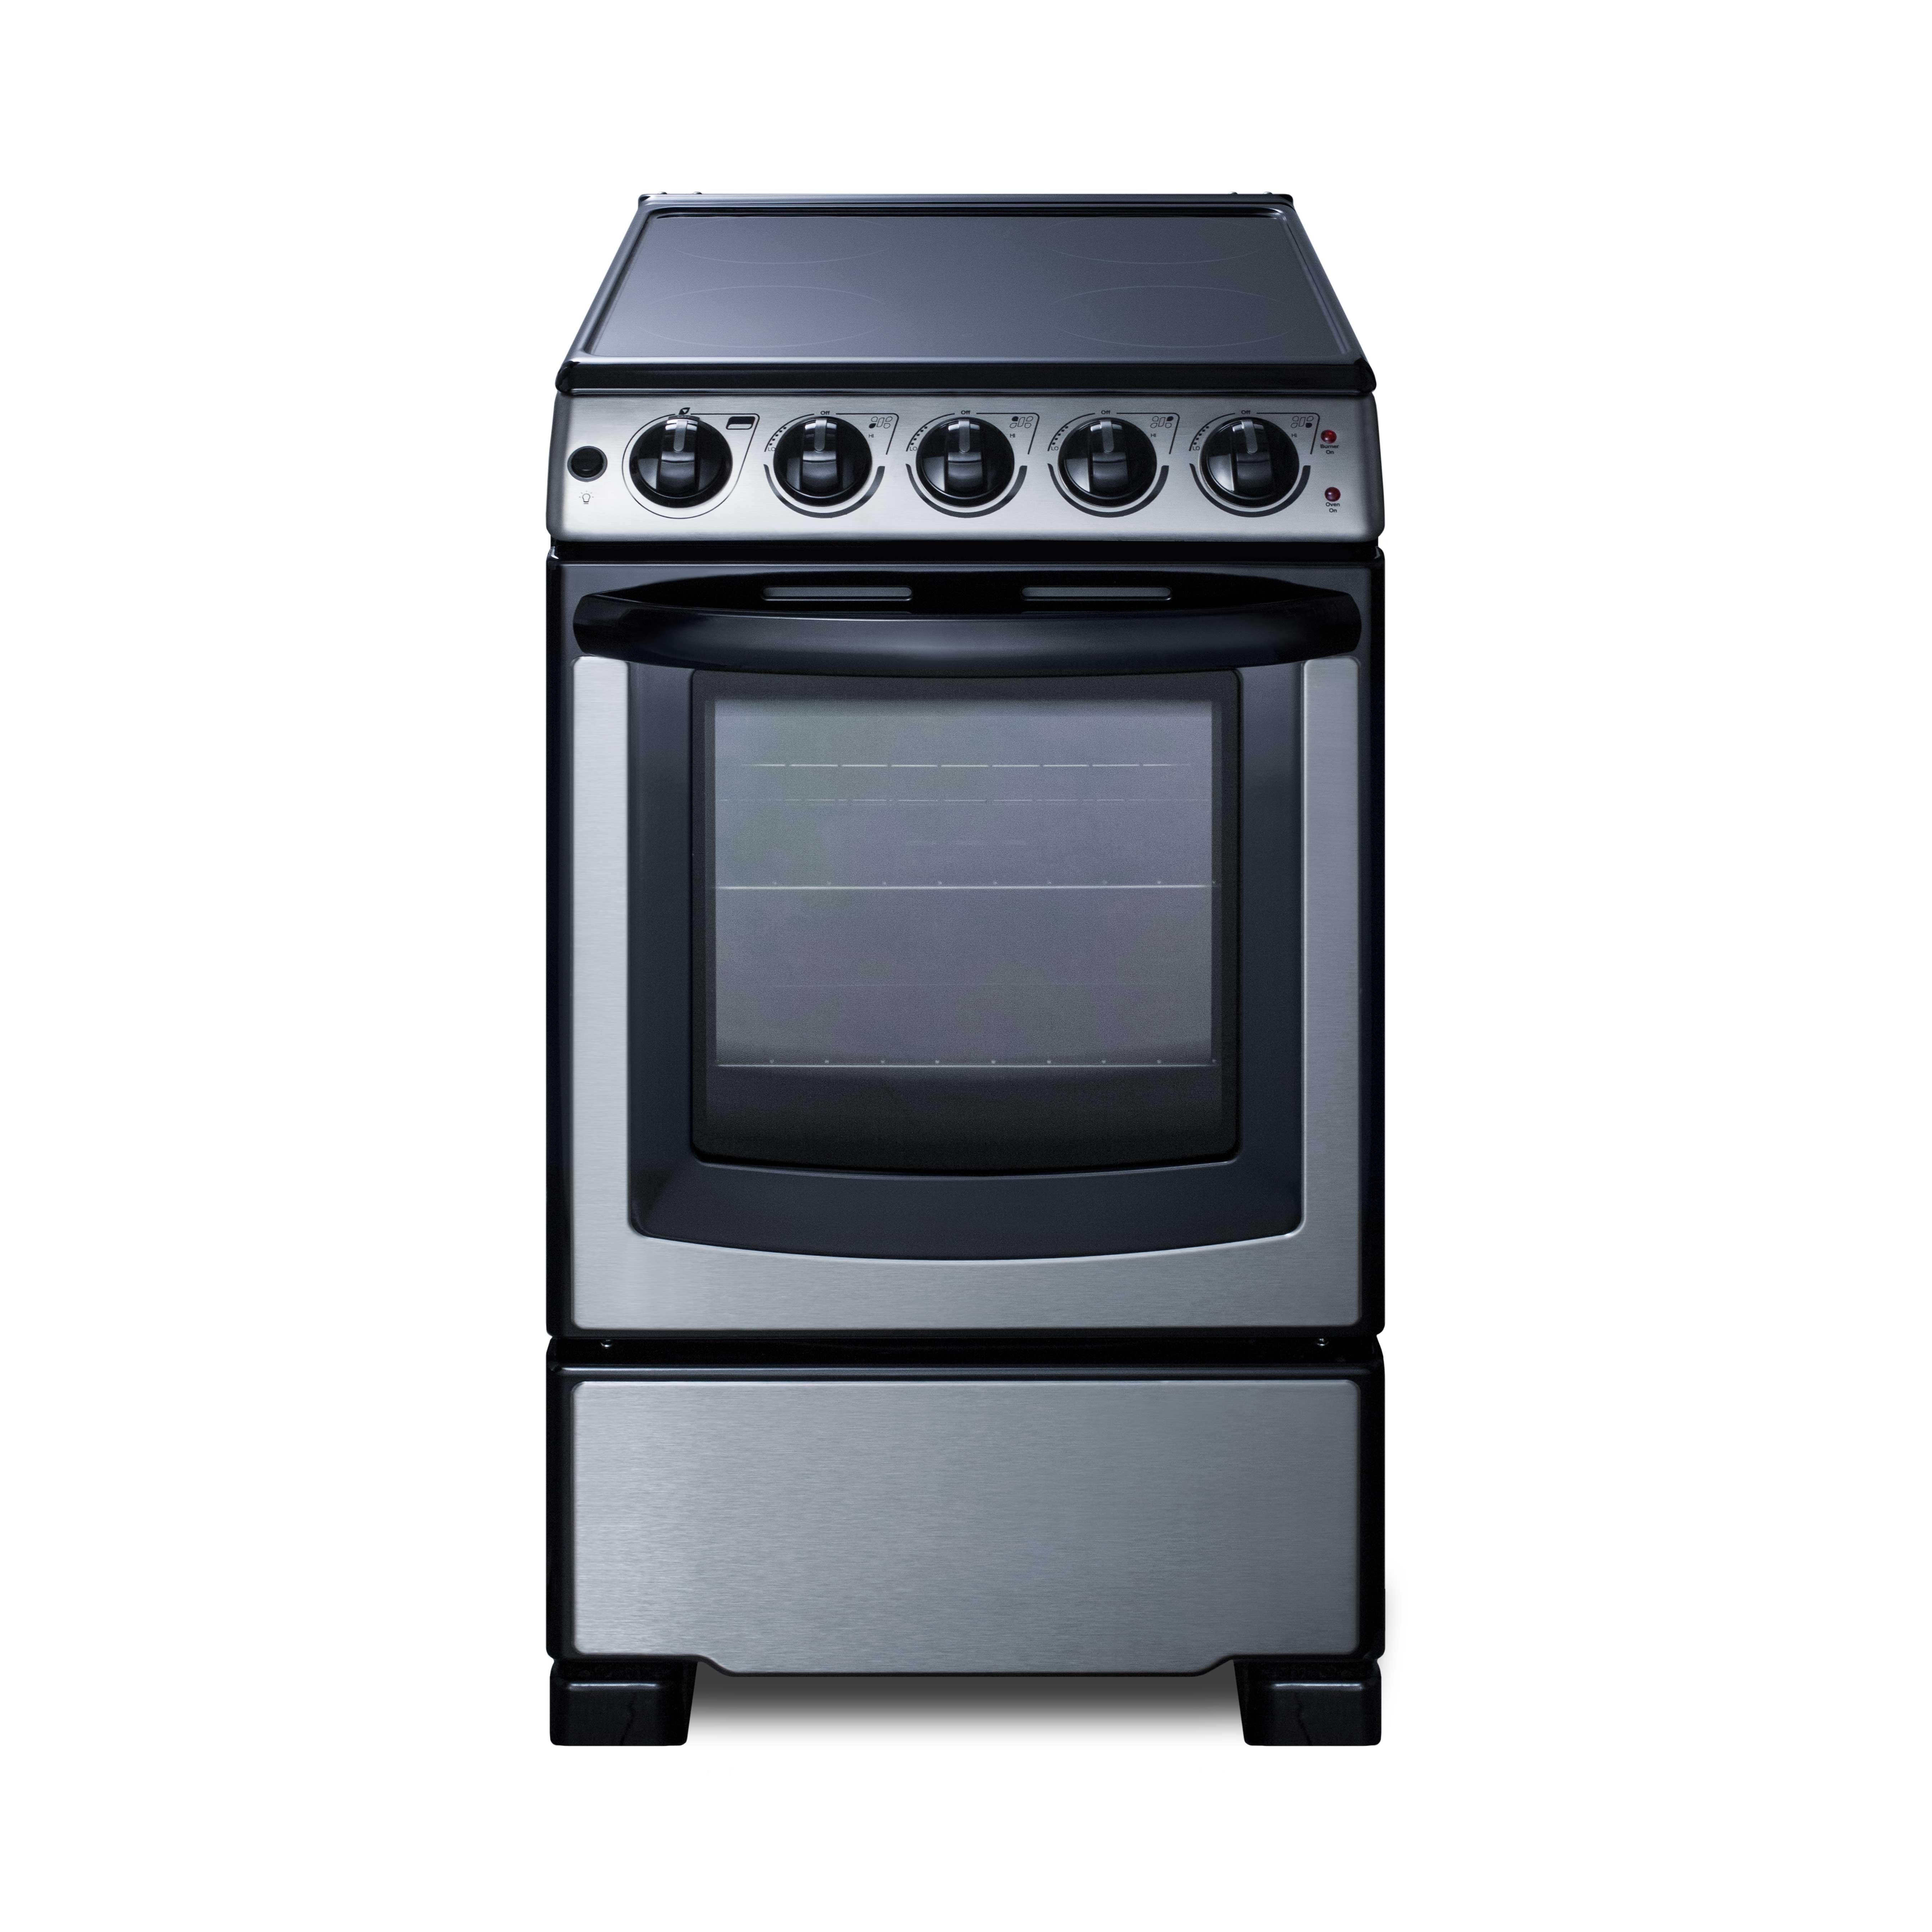 Summit Appliance REX2071SSRT range, residential domestic